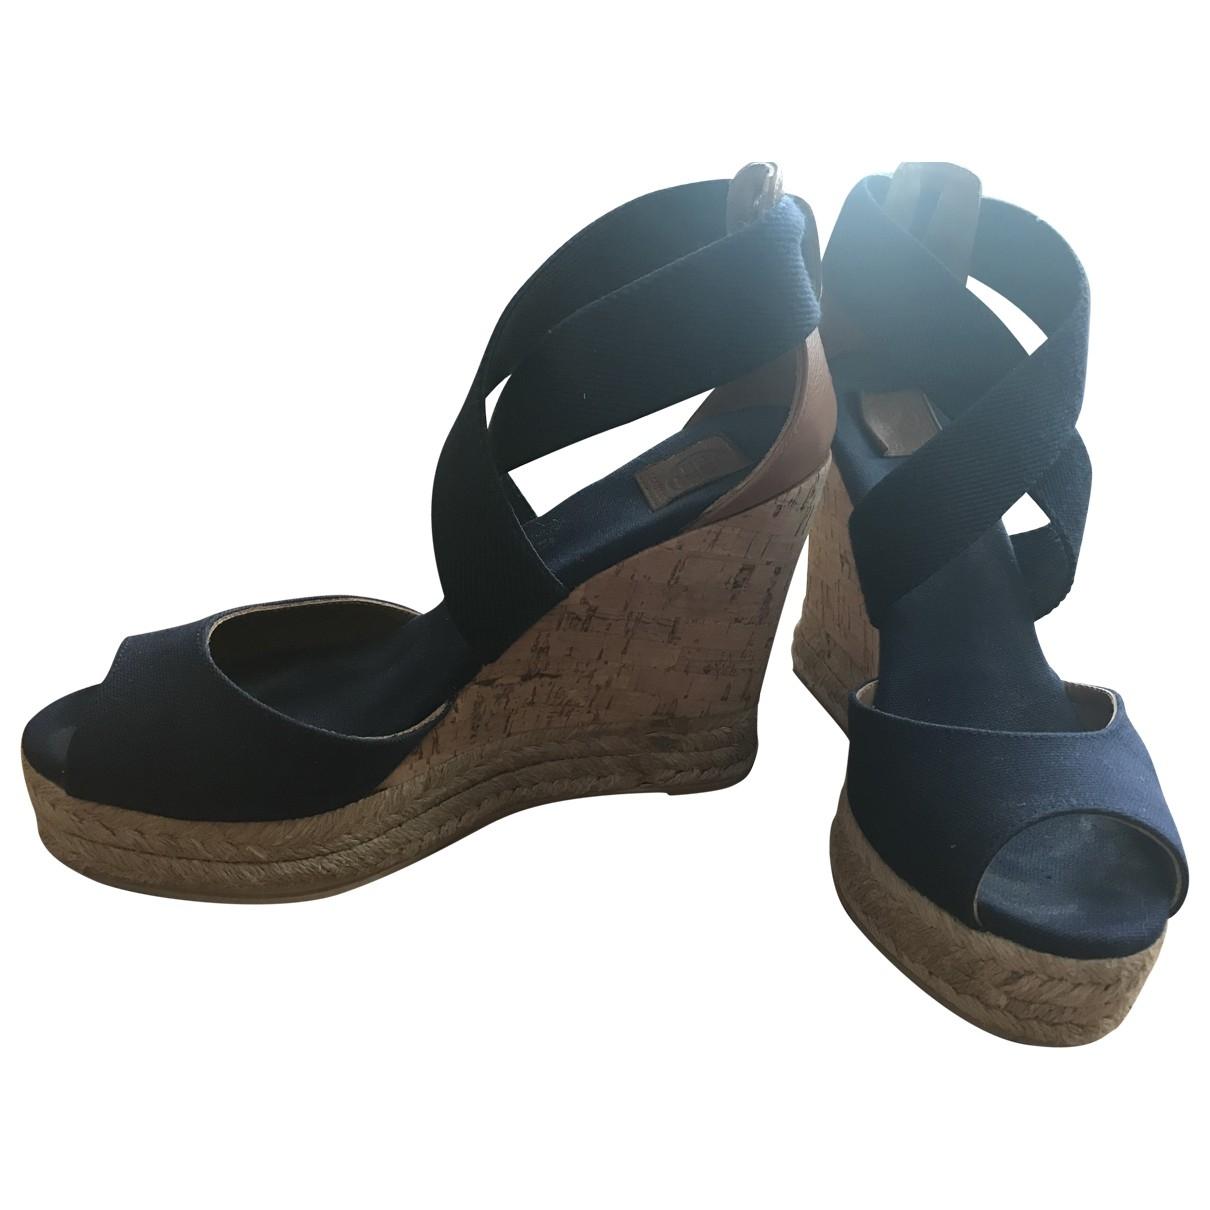 Tory Burch \N Blue Cloth Sandals for Women 6US